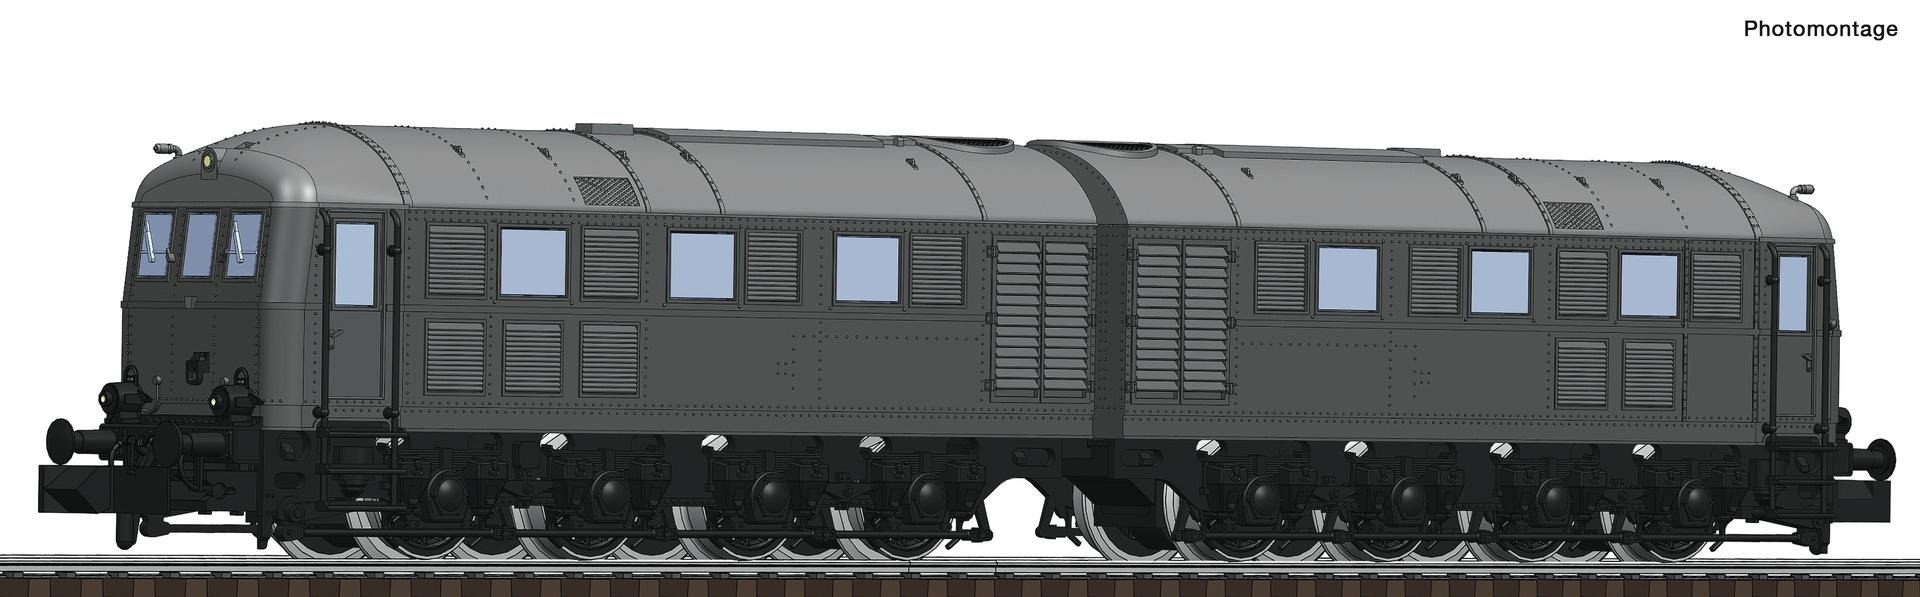 725101 Doppel-Diesellok V188 grau-1